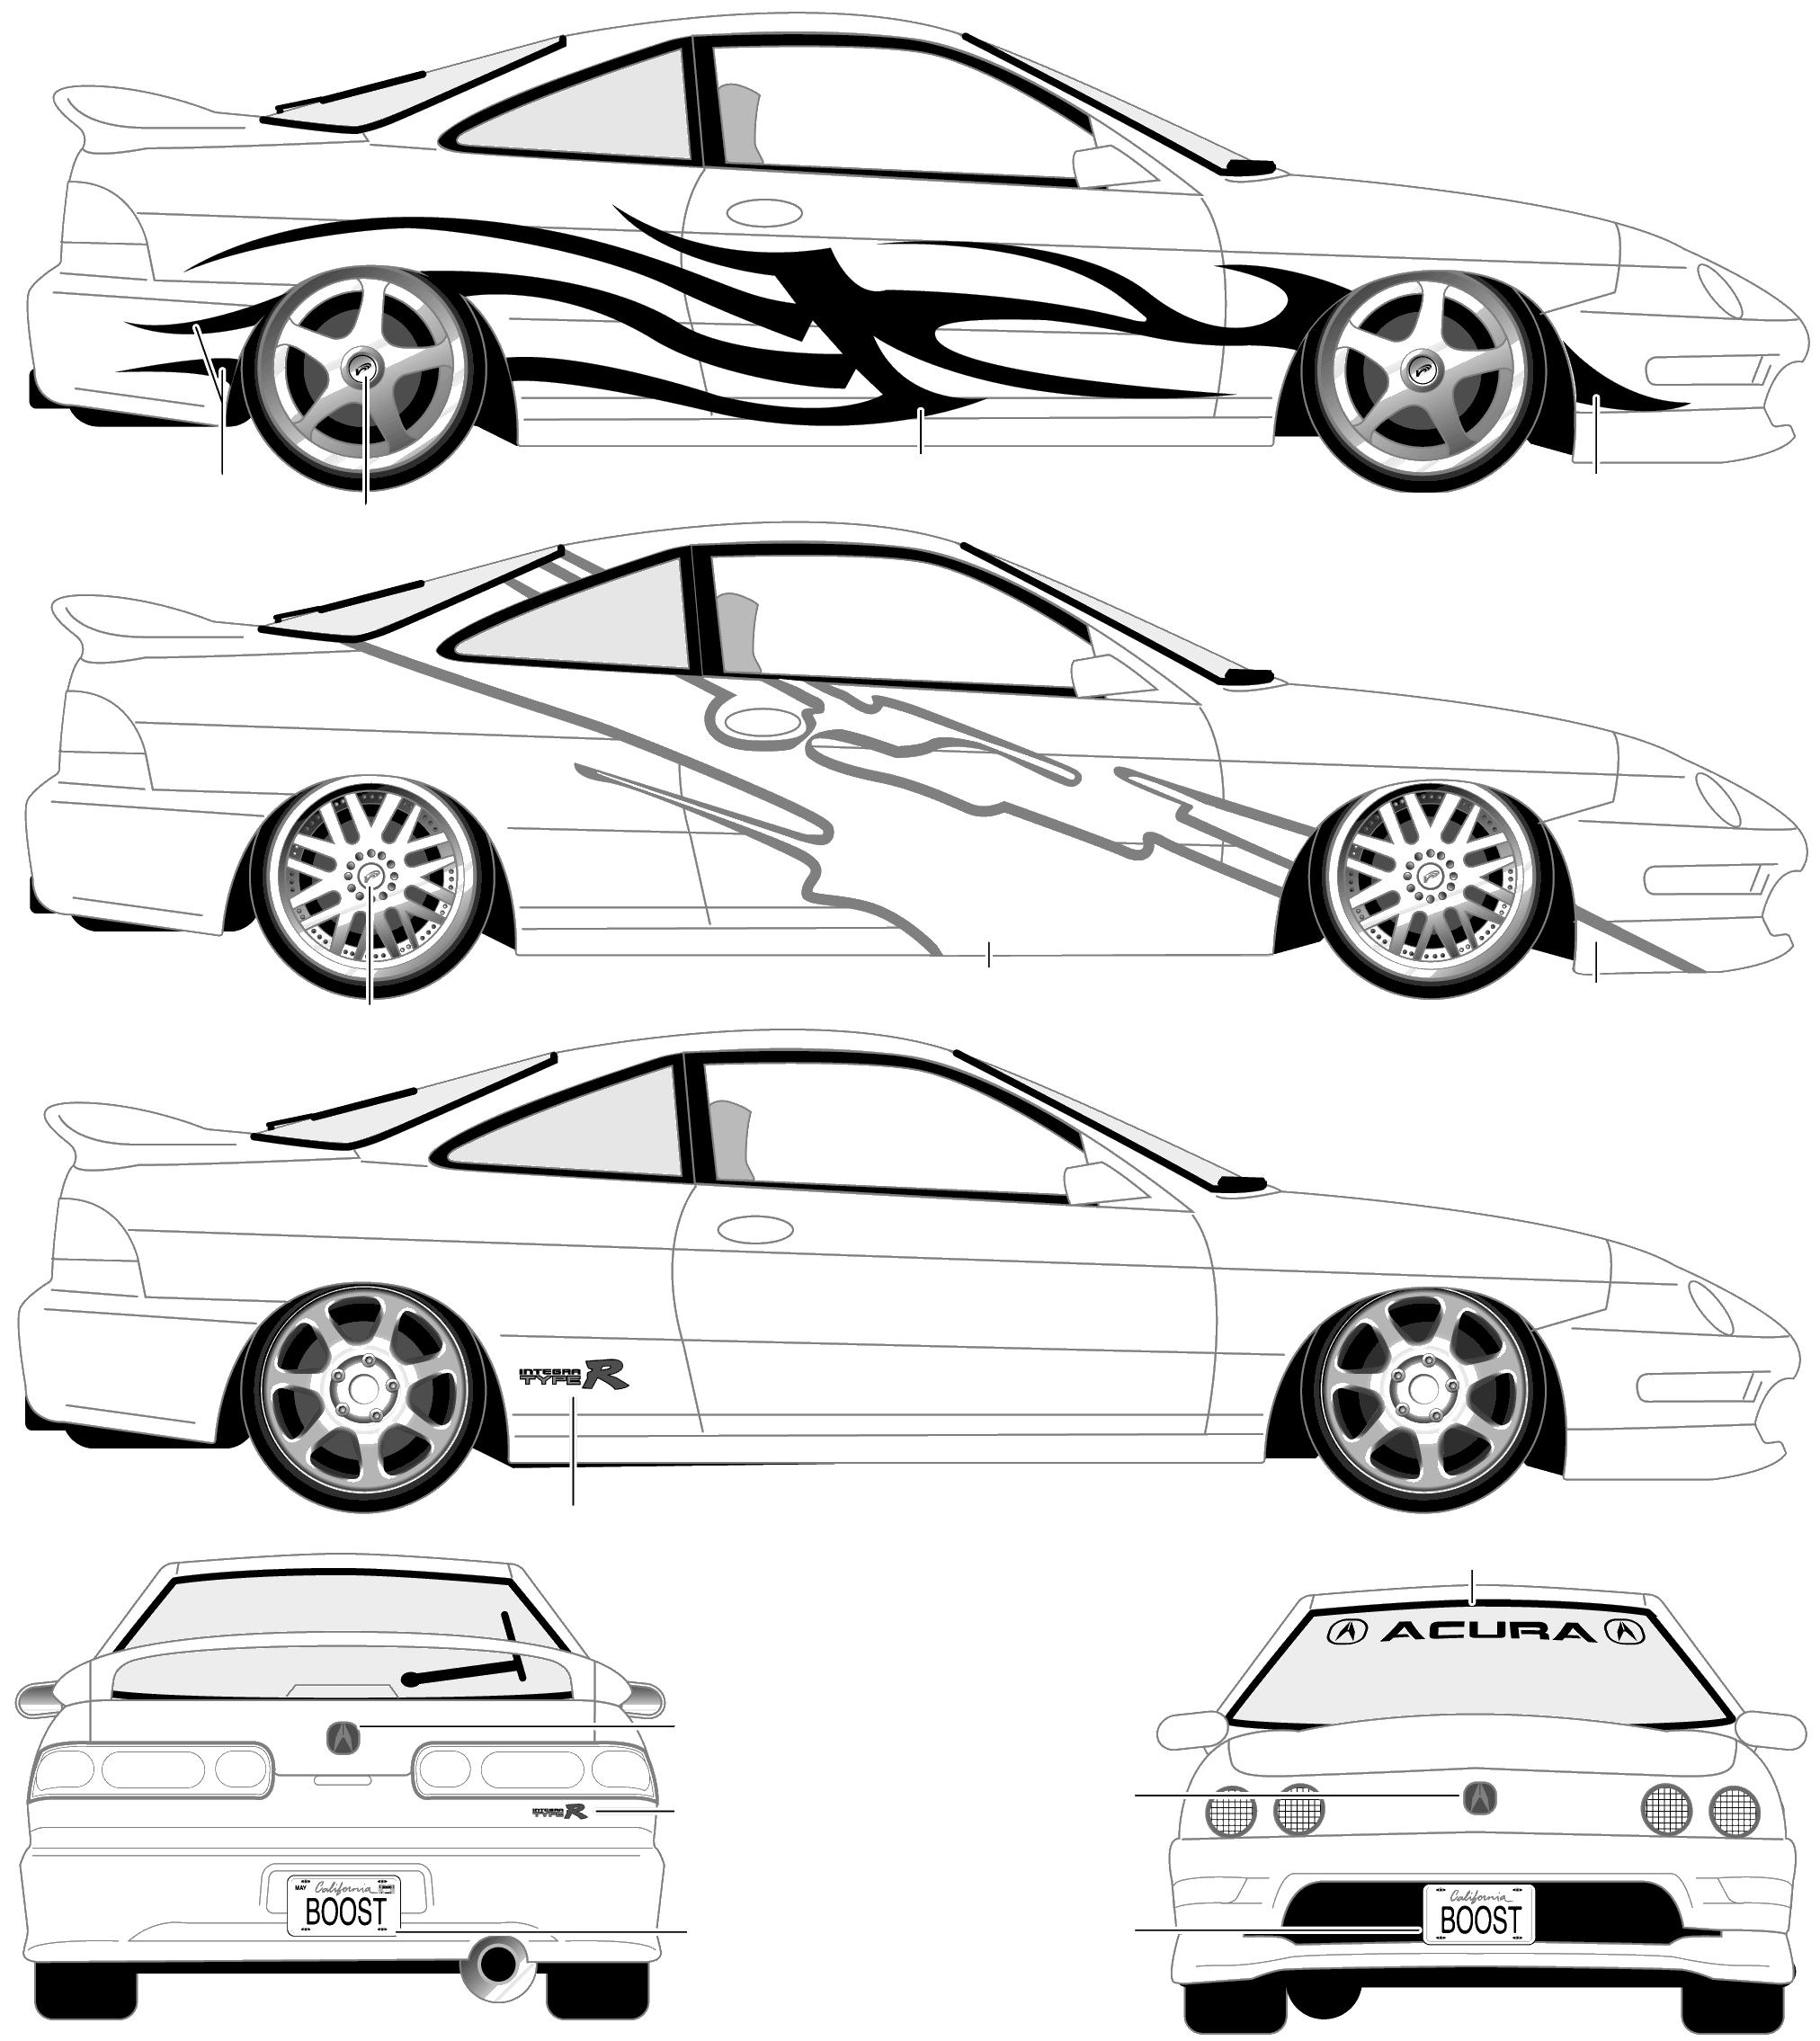 1998 Acura Integra R Coupe Blueprints Free